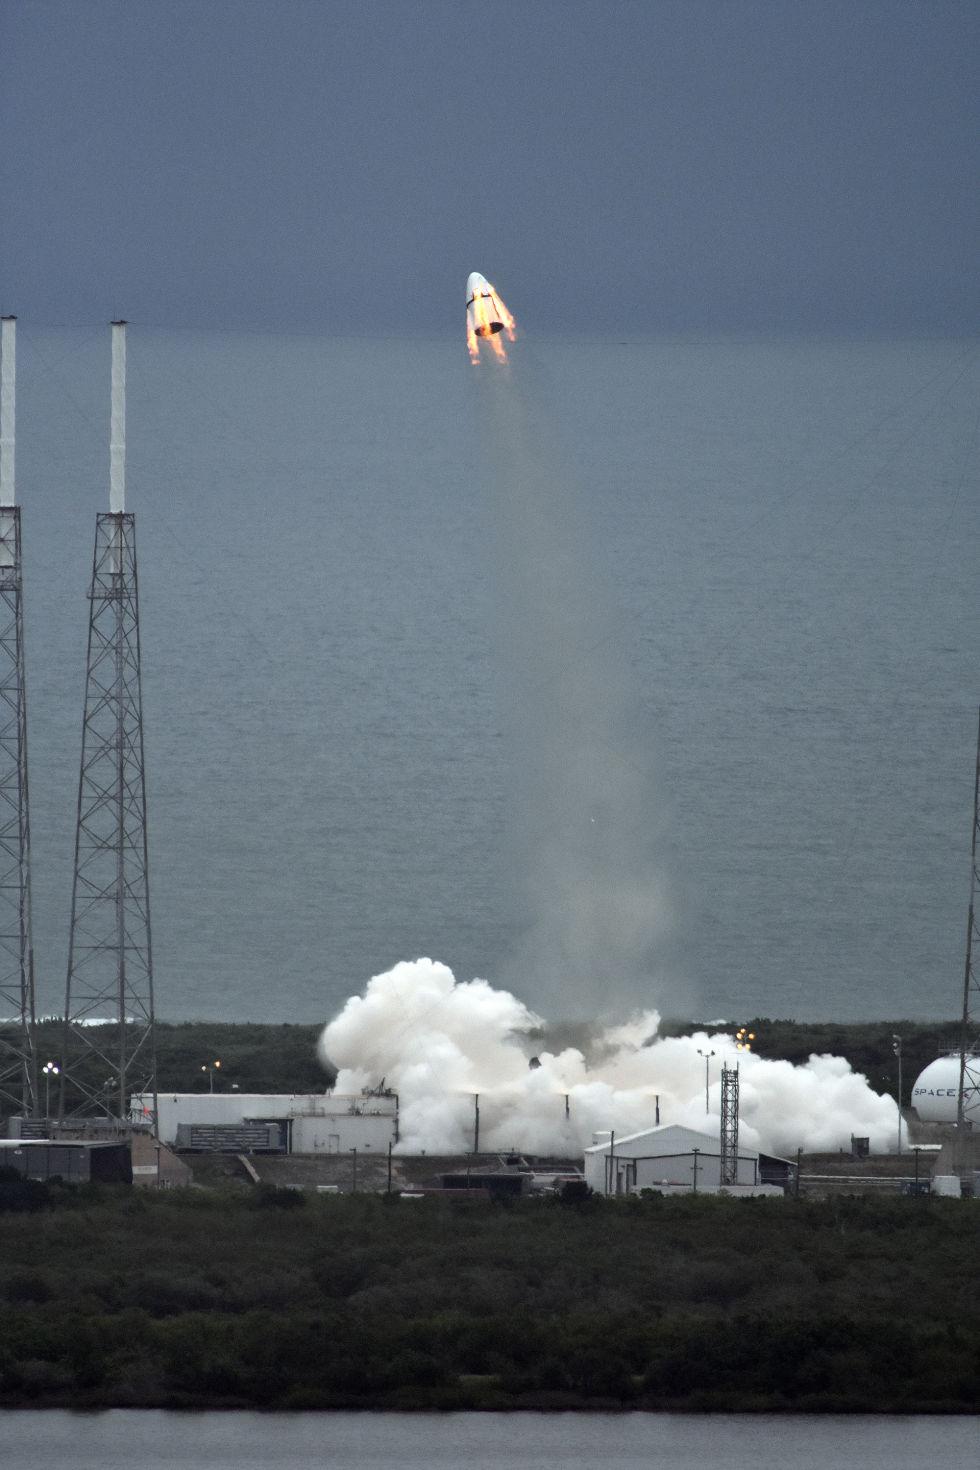 spacex thruster - photo #19